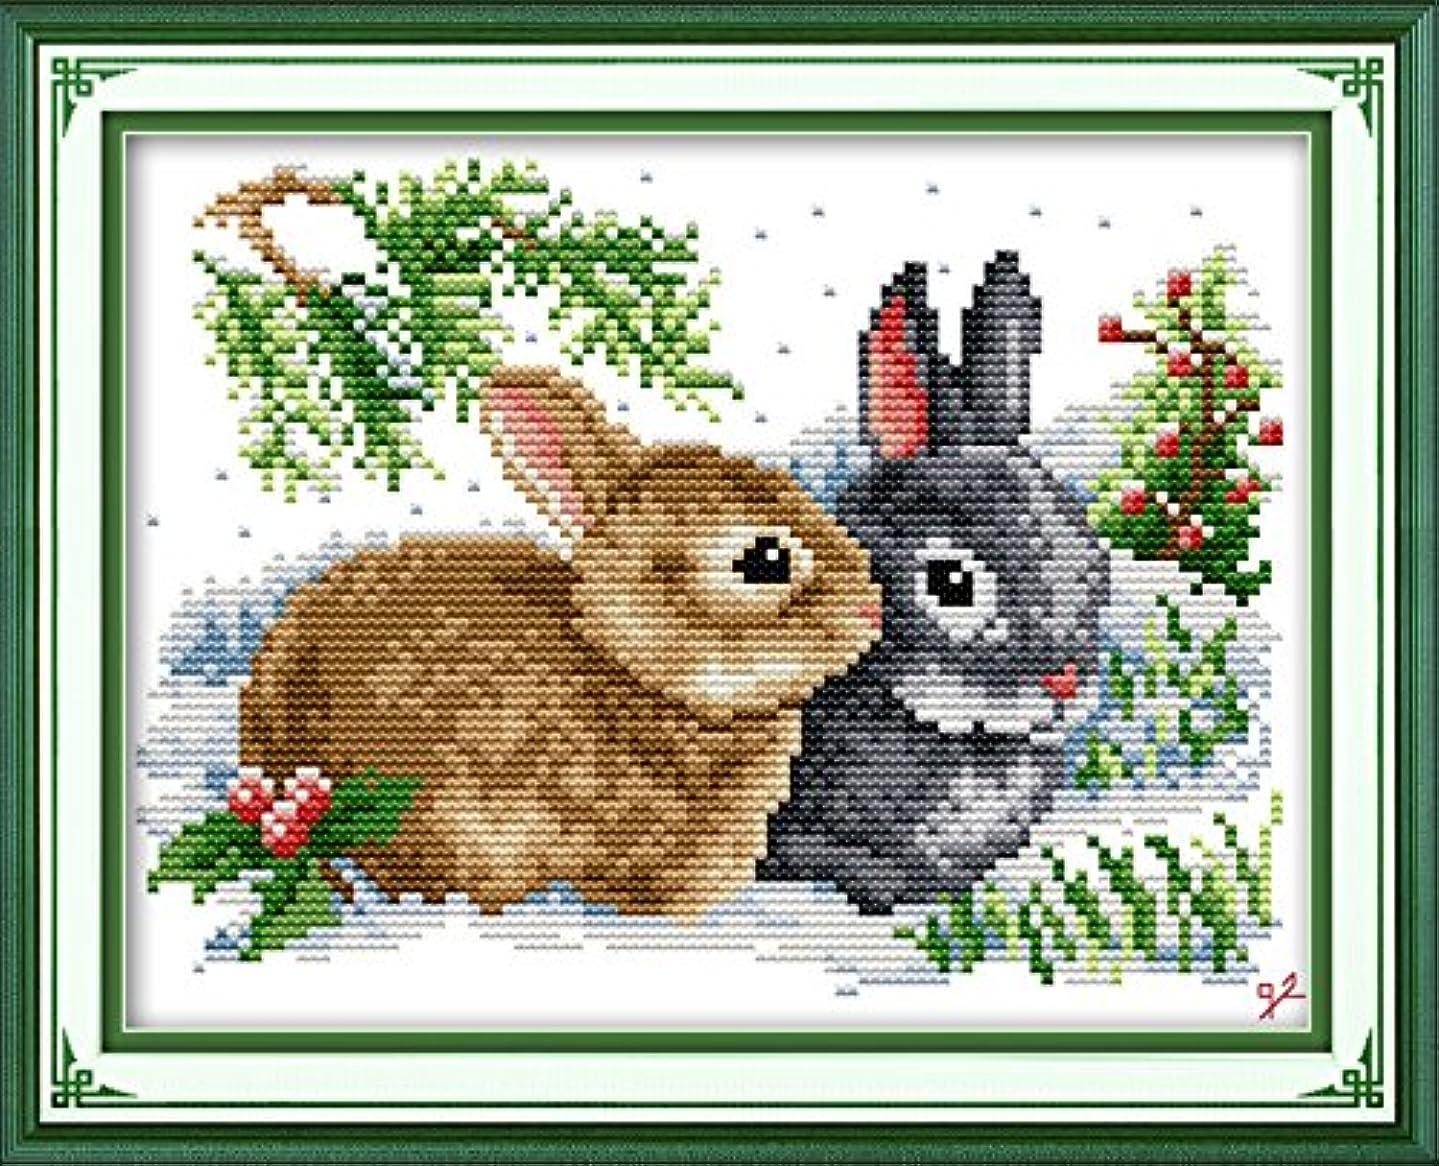 Joy Sunday Lucky Rabbits Cross Stitch Kits,11CT Stamped Cross Stitch Kit DIY Cross-Stitch Hand Embroidery kits DMC Floor DIY Art Crafts Sewing Needlework DMC Thread 13''x10''